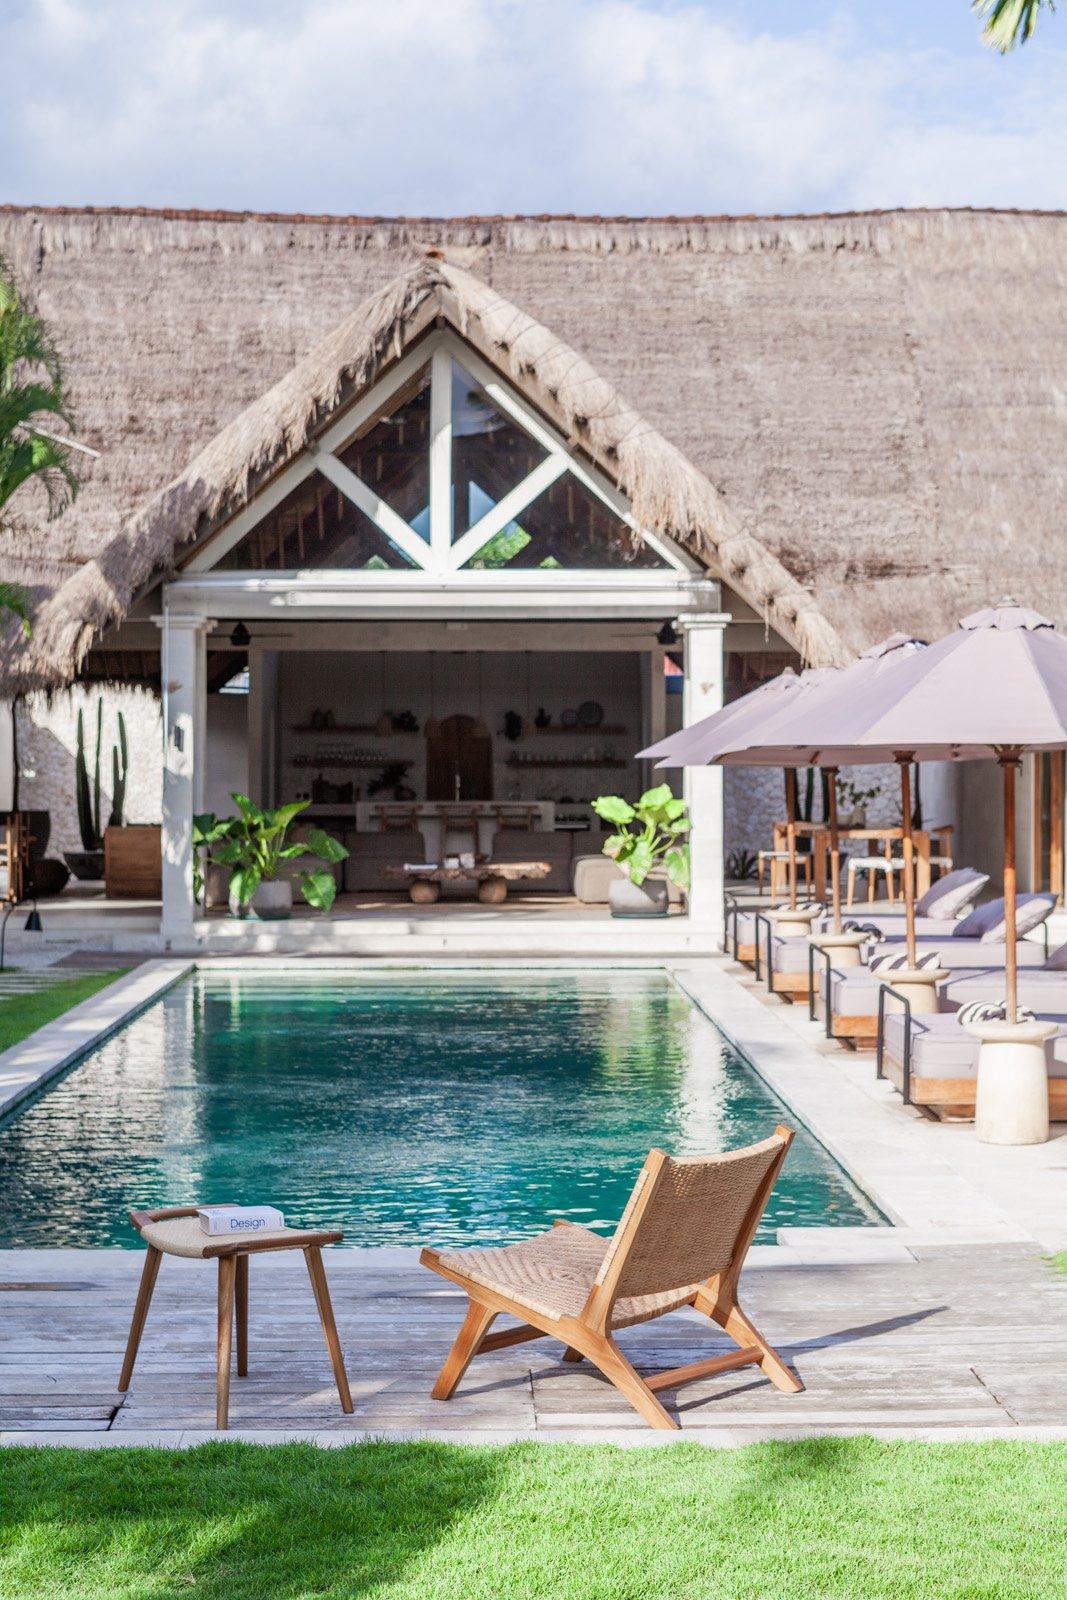 Bali Interiors- Bali Bungalow